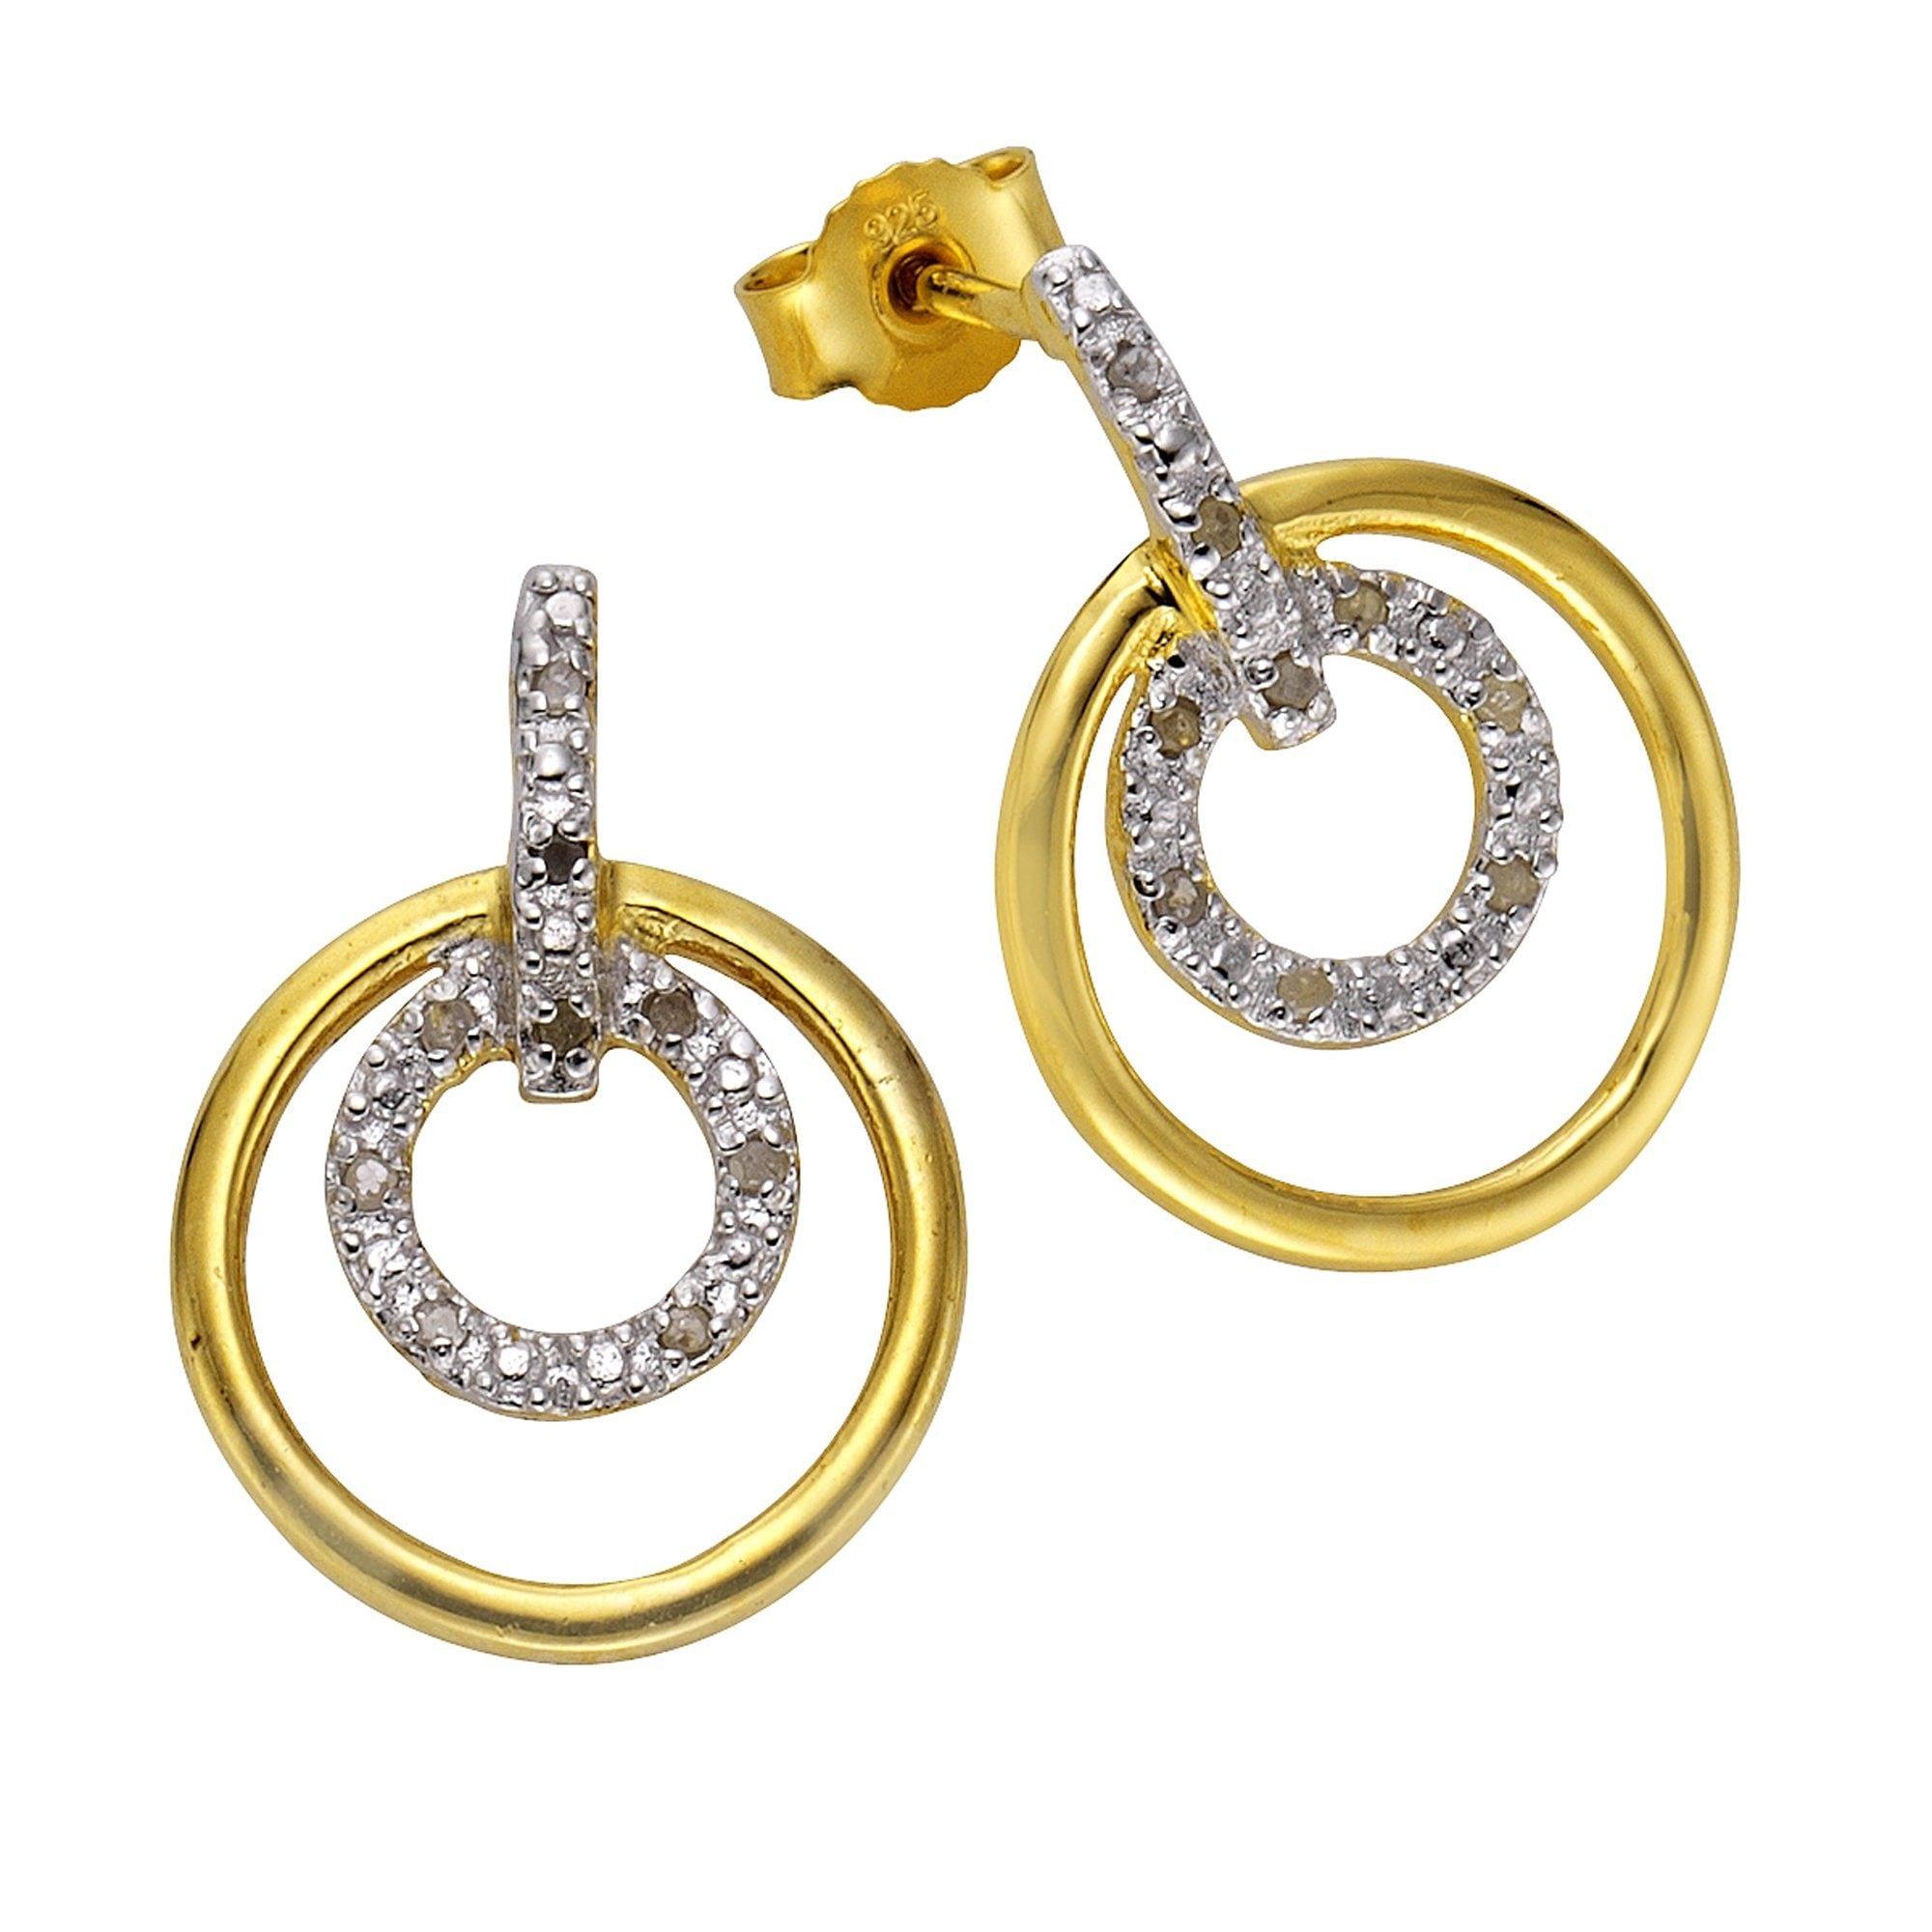 Diamonds by Ellen K Ohrstecker 925/- Sterling Silber Diamanten | Schmuck > Ohrschmuck & Ohrringe > Ohrstecker | Weiß | Diamonds By Ellen K.